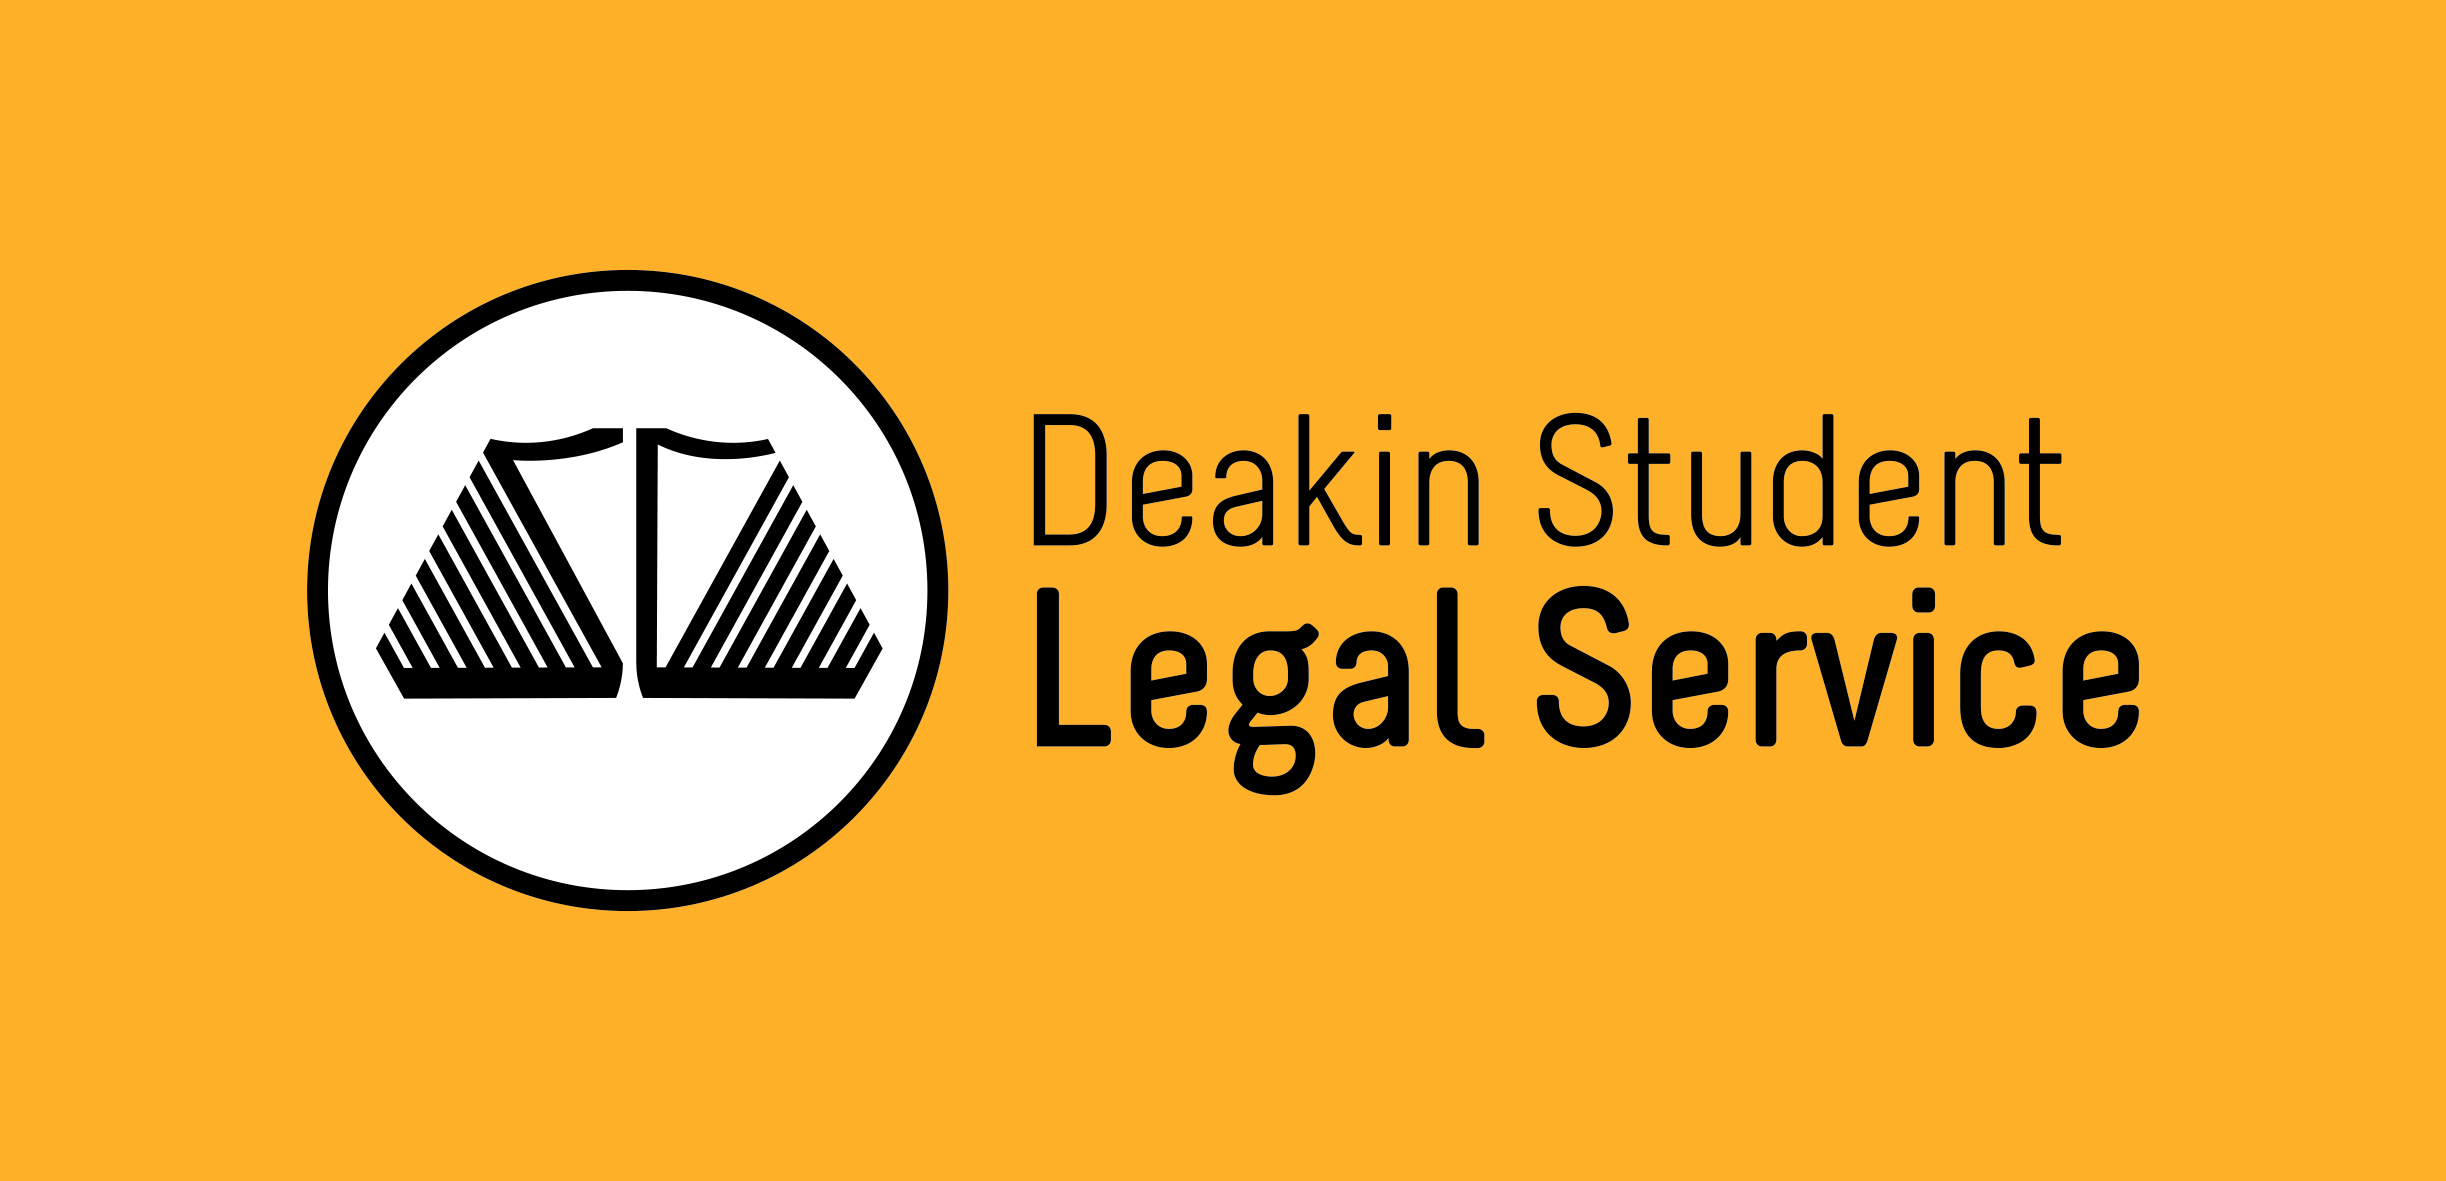 Deakin Student Legal Service Logo (Dark)